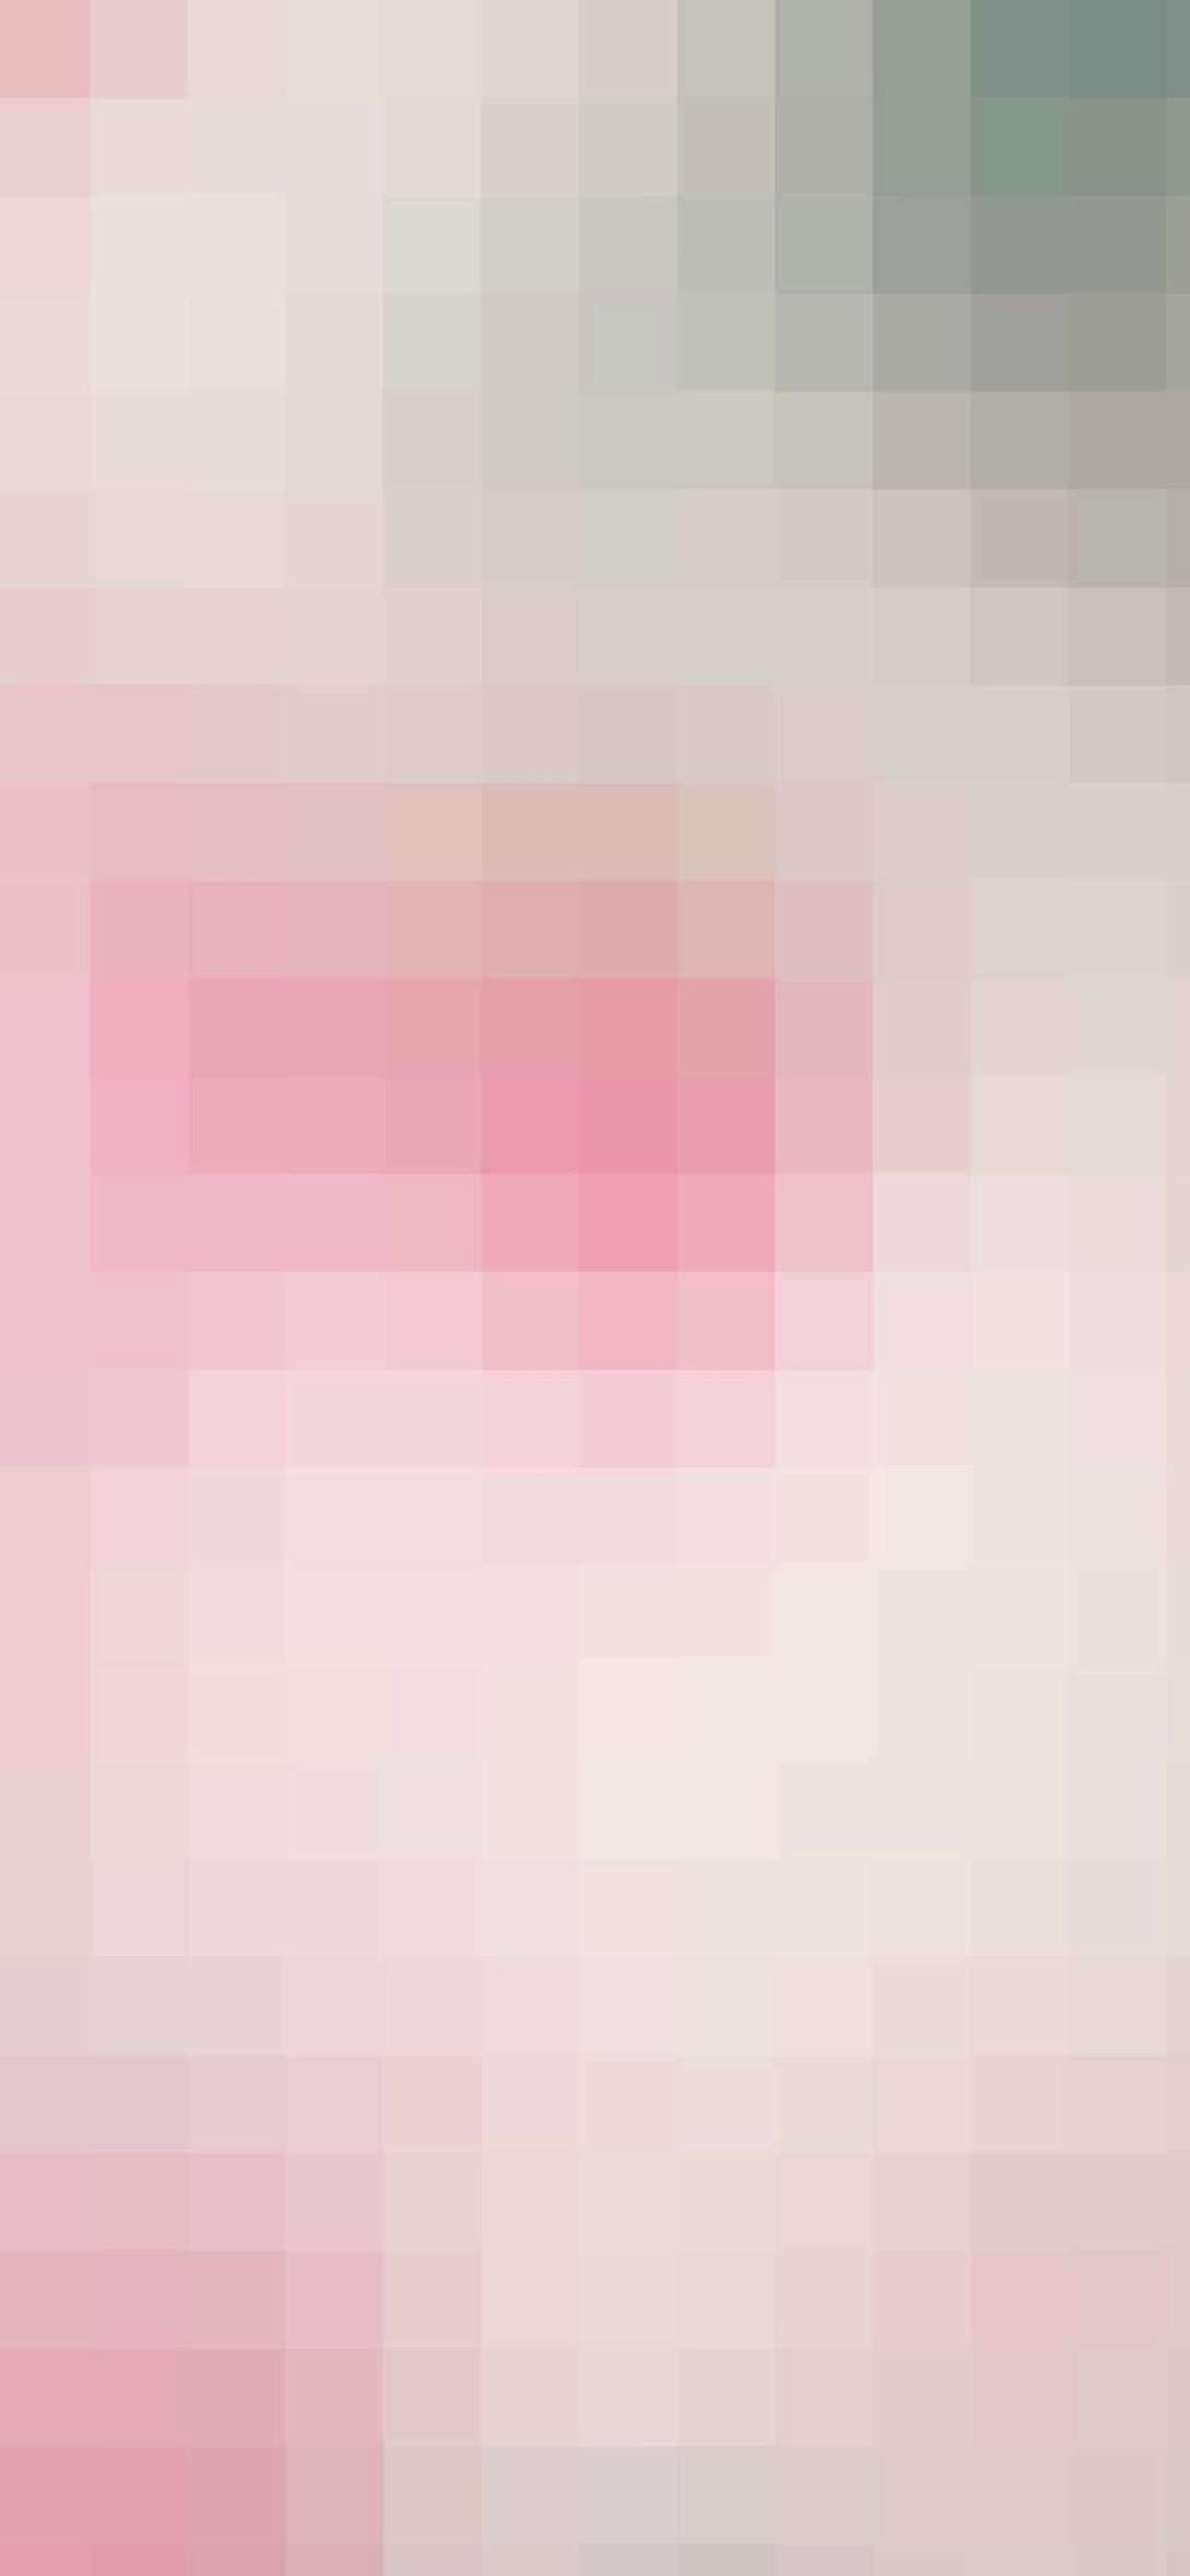 iPhone XS Max 壁紙 wallpaper 0082